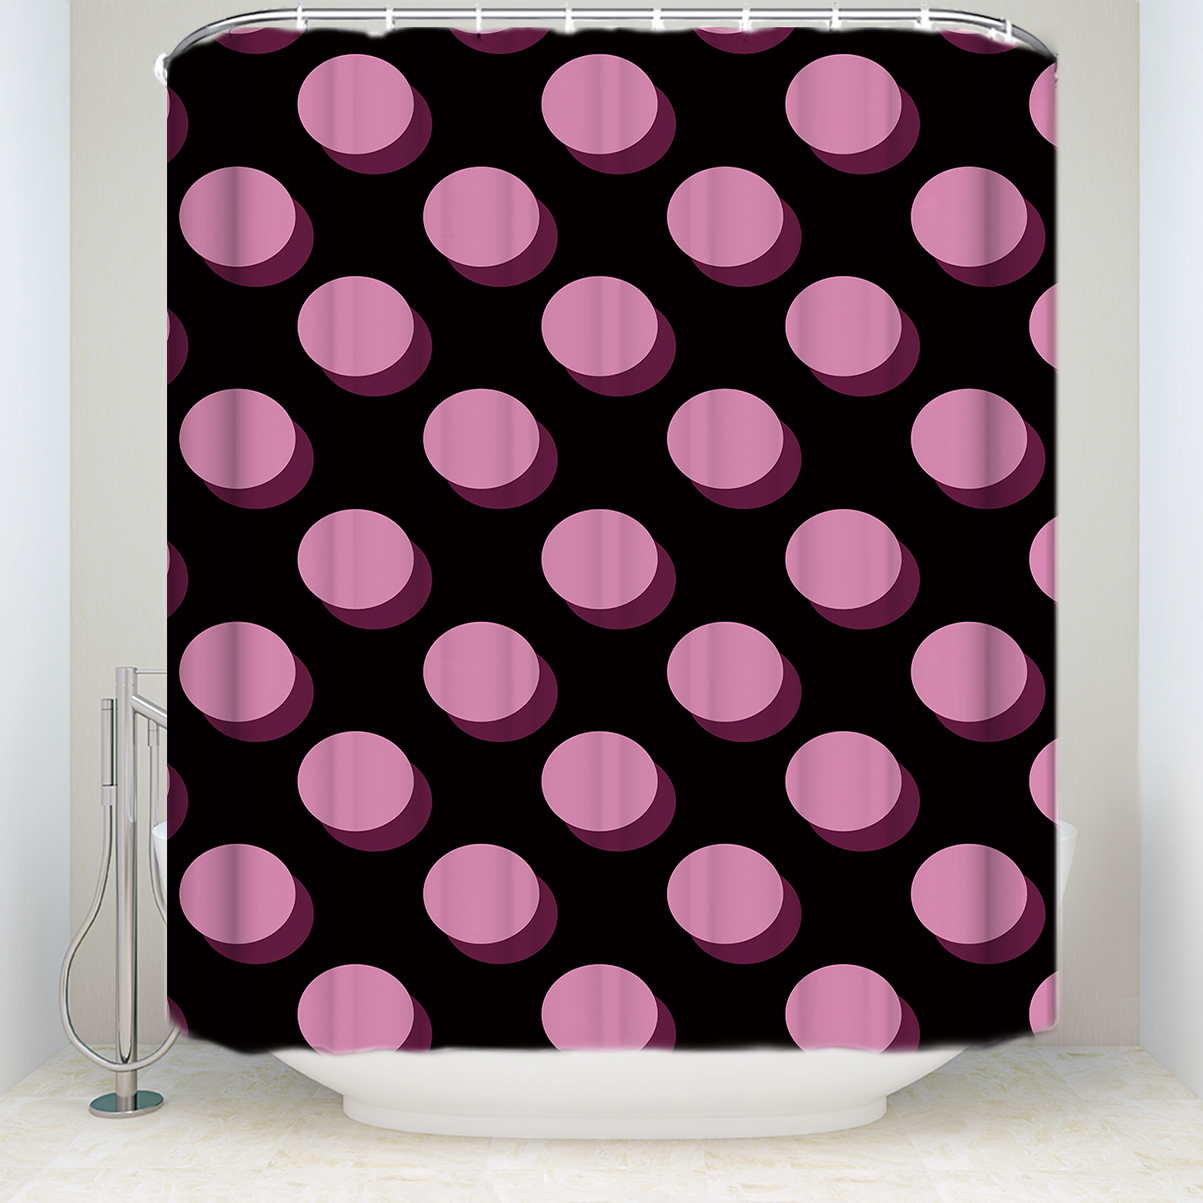 USA WC Shower Curtain Rideau Elephant Antibacterial Waterproof with 12 hooks